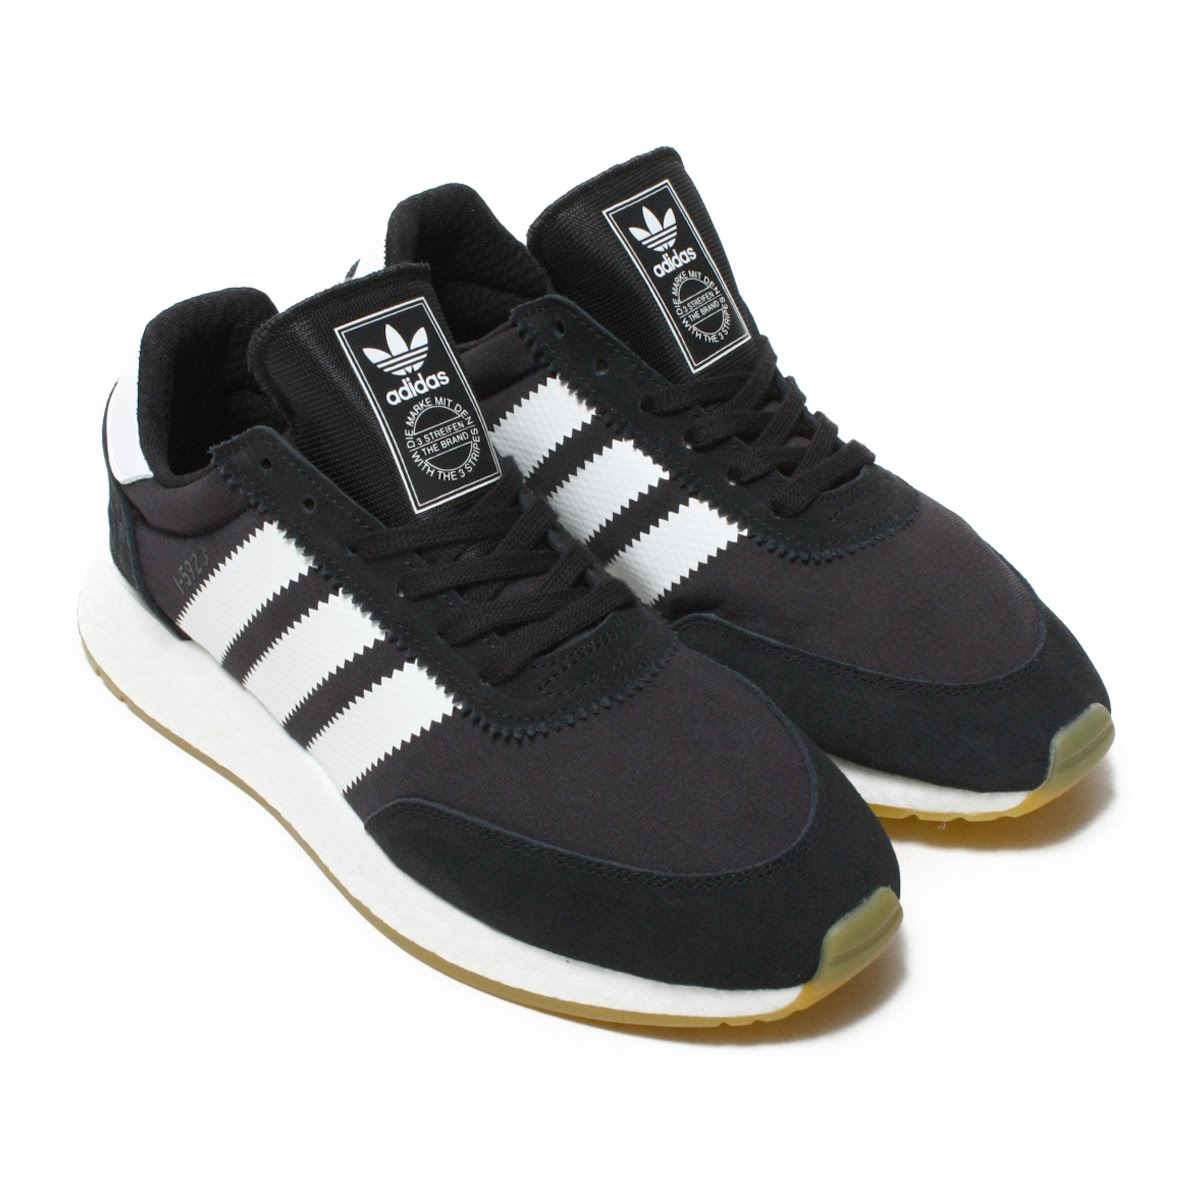 adidas Originals I-5923(アディダス オリジナルス I-5923)Core Black/Running White/Gum【メンズ スニーカー】18FW-I